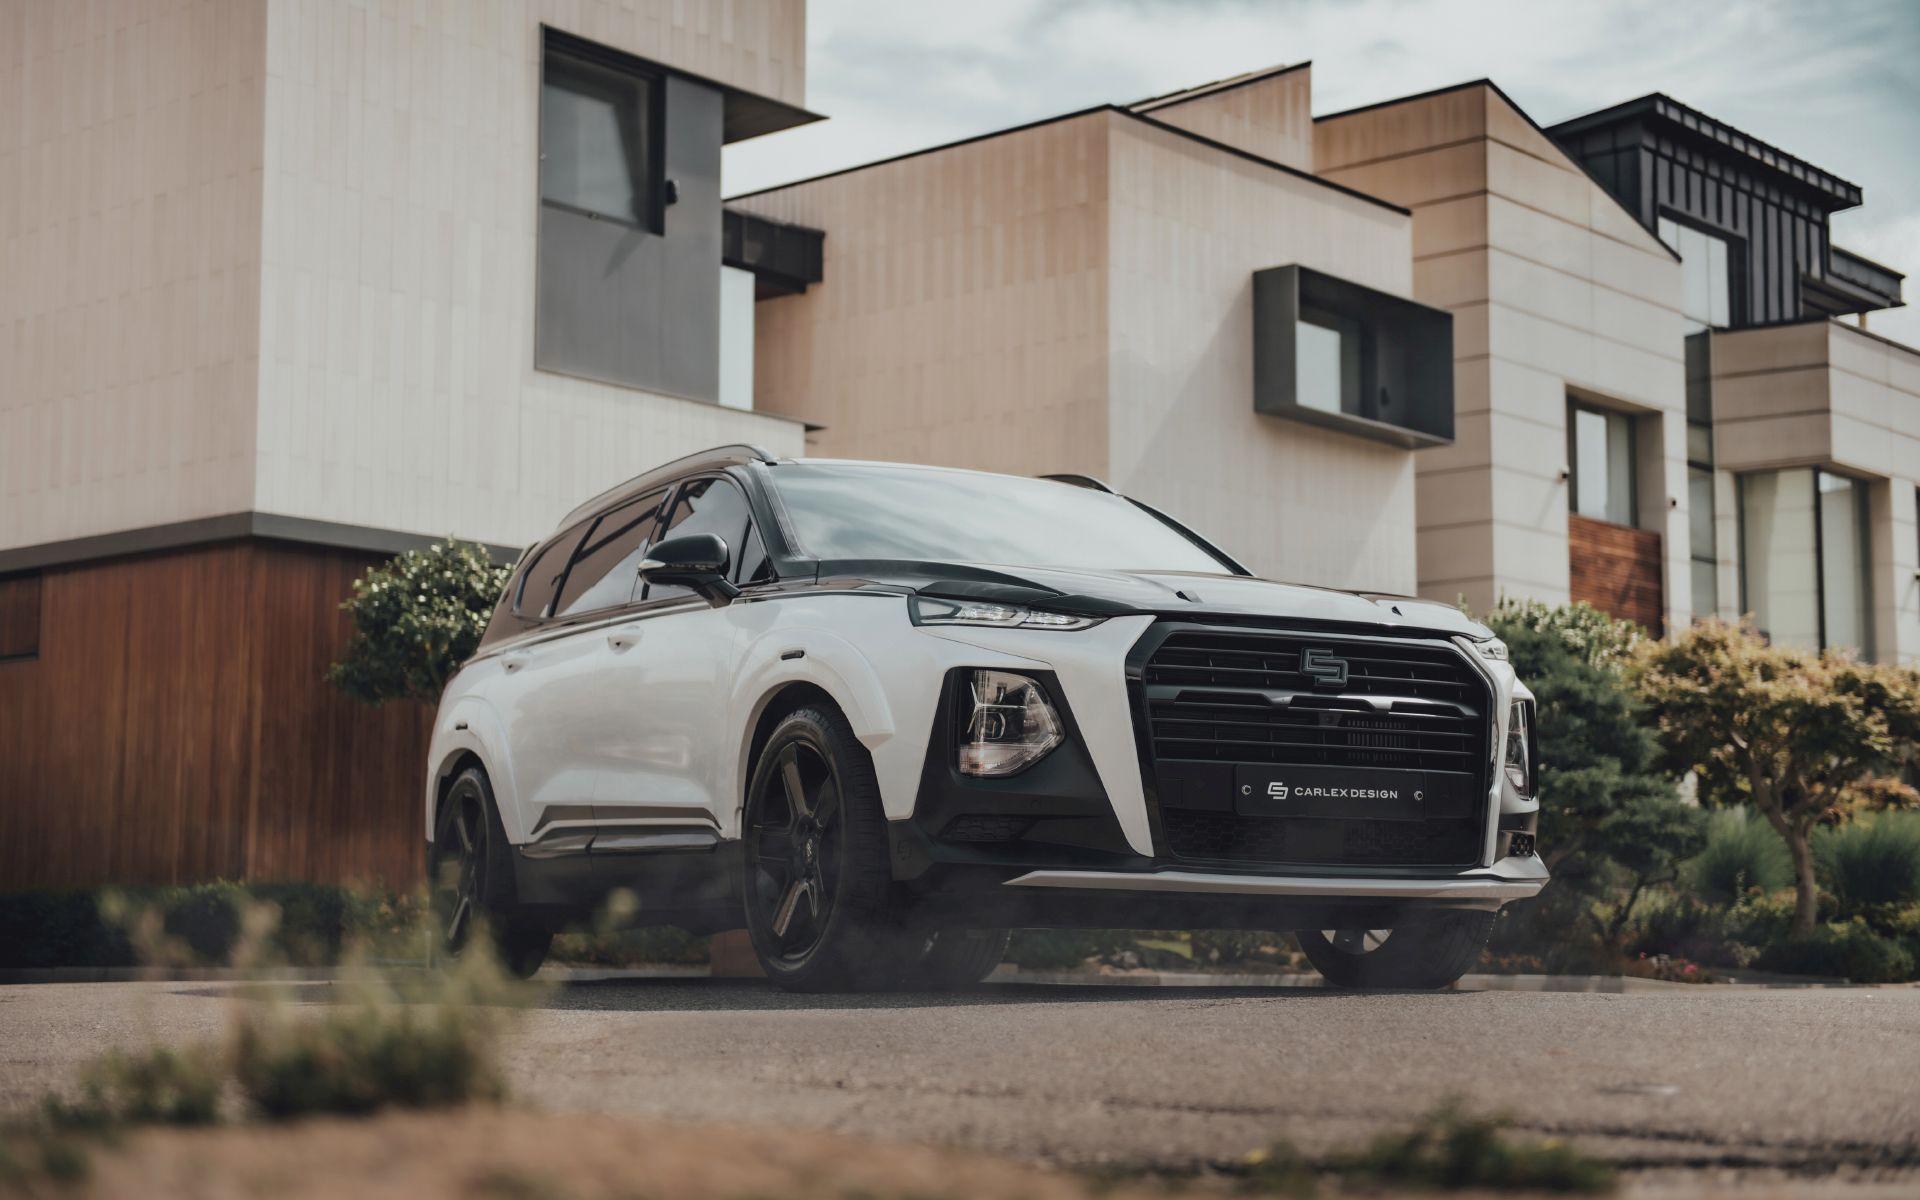 Hyundai-Santa-Fe-by-Carlex-Design-29